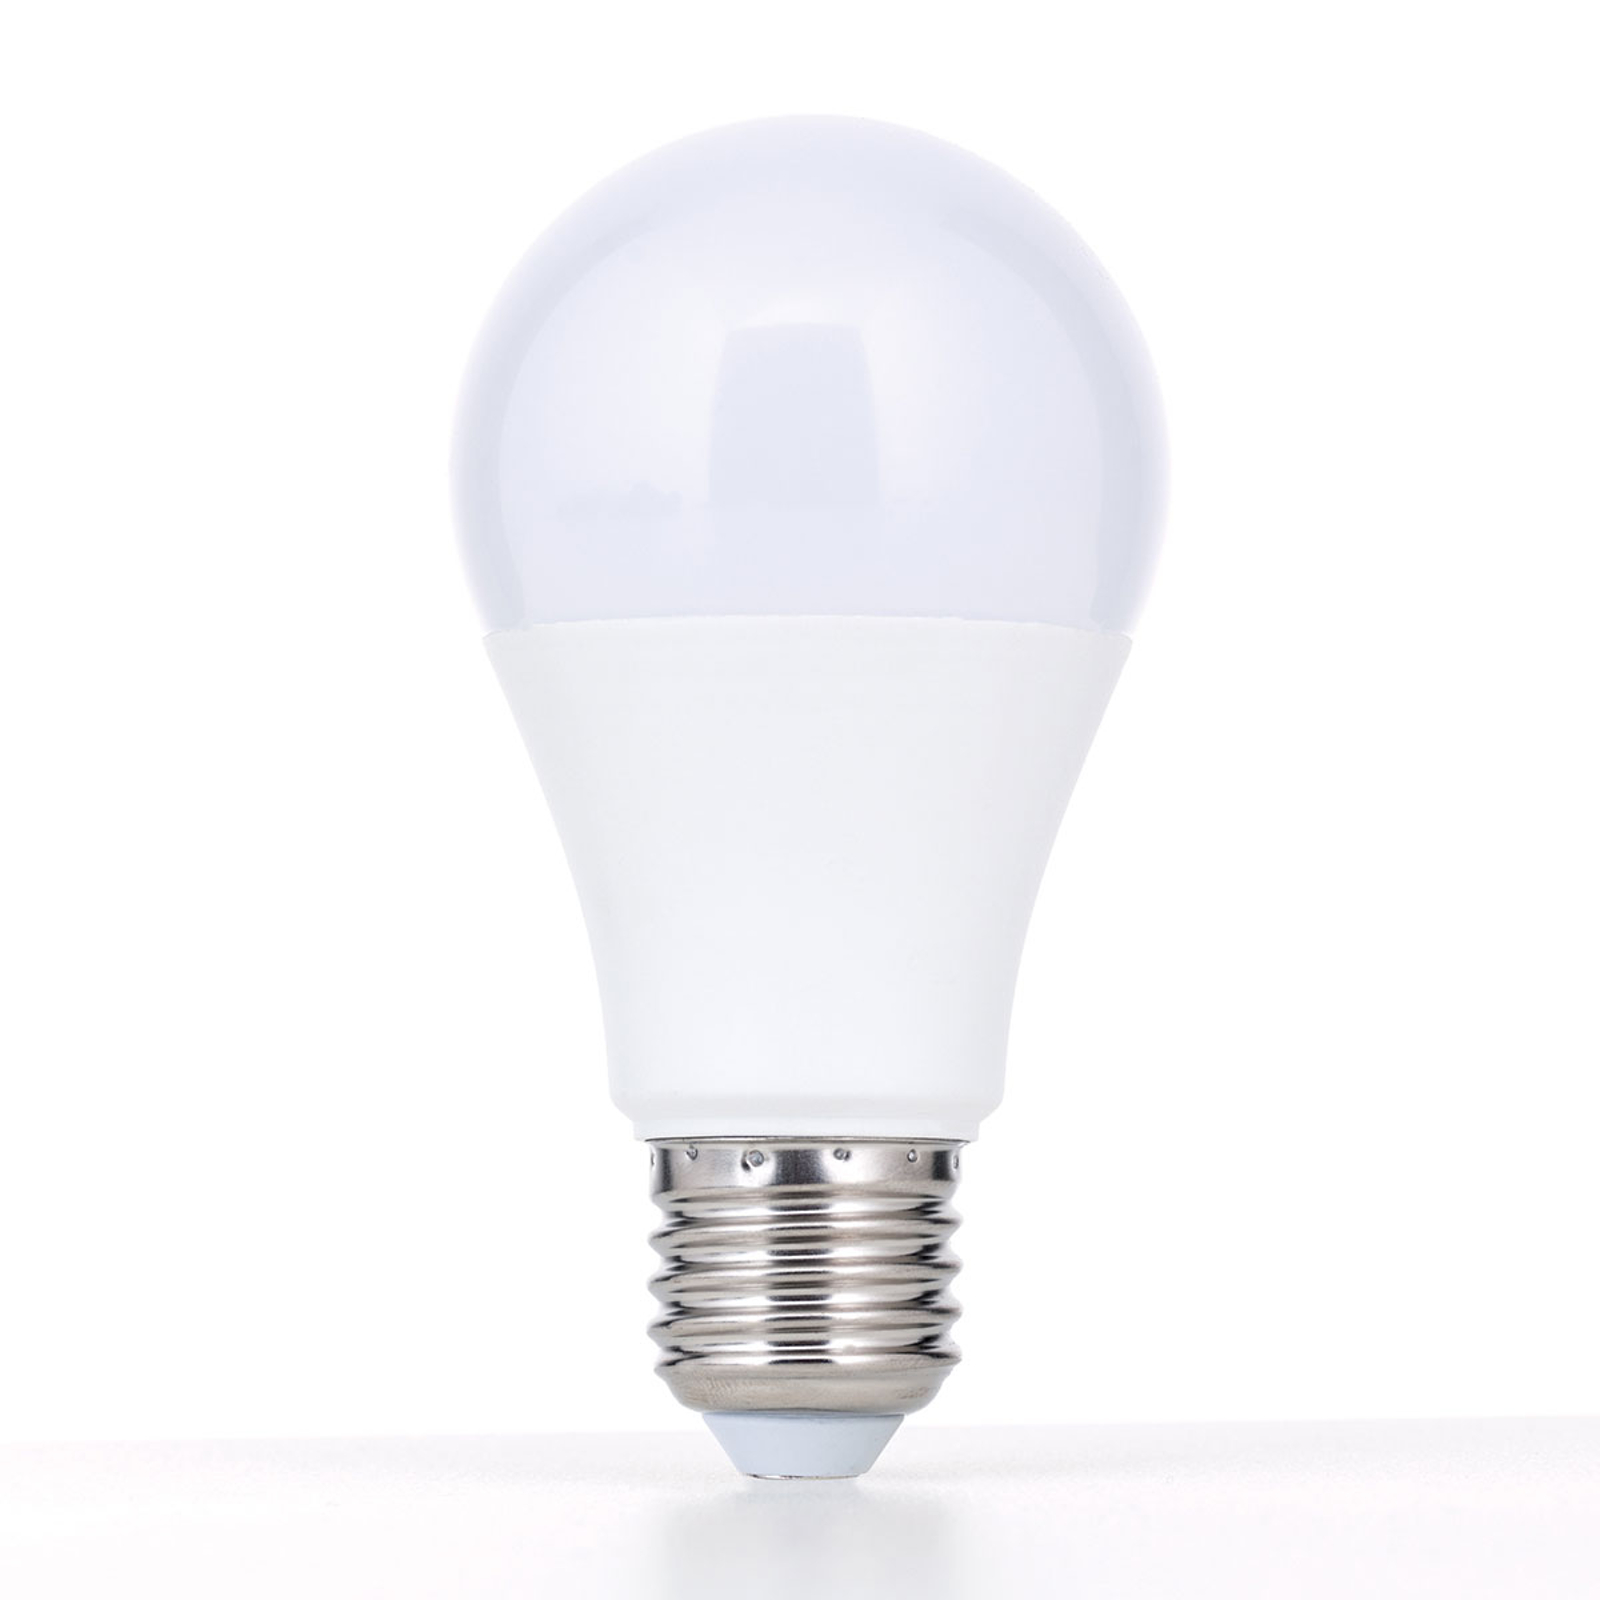 E27 LED-Lampe 5W warmweiß, opal, nicht dimmbar